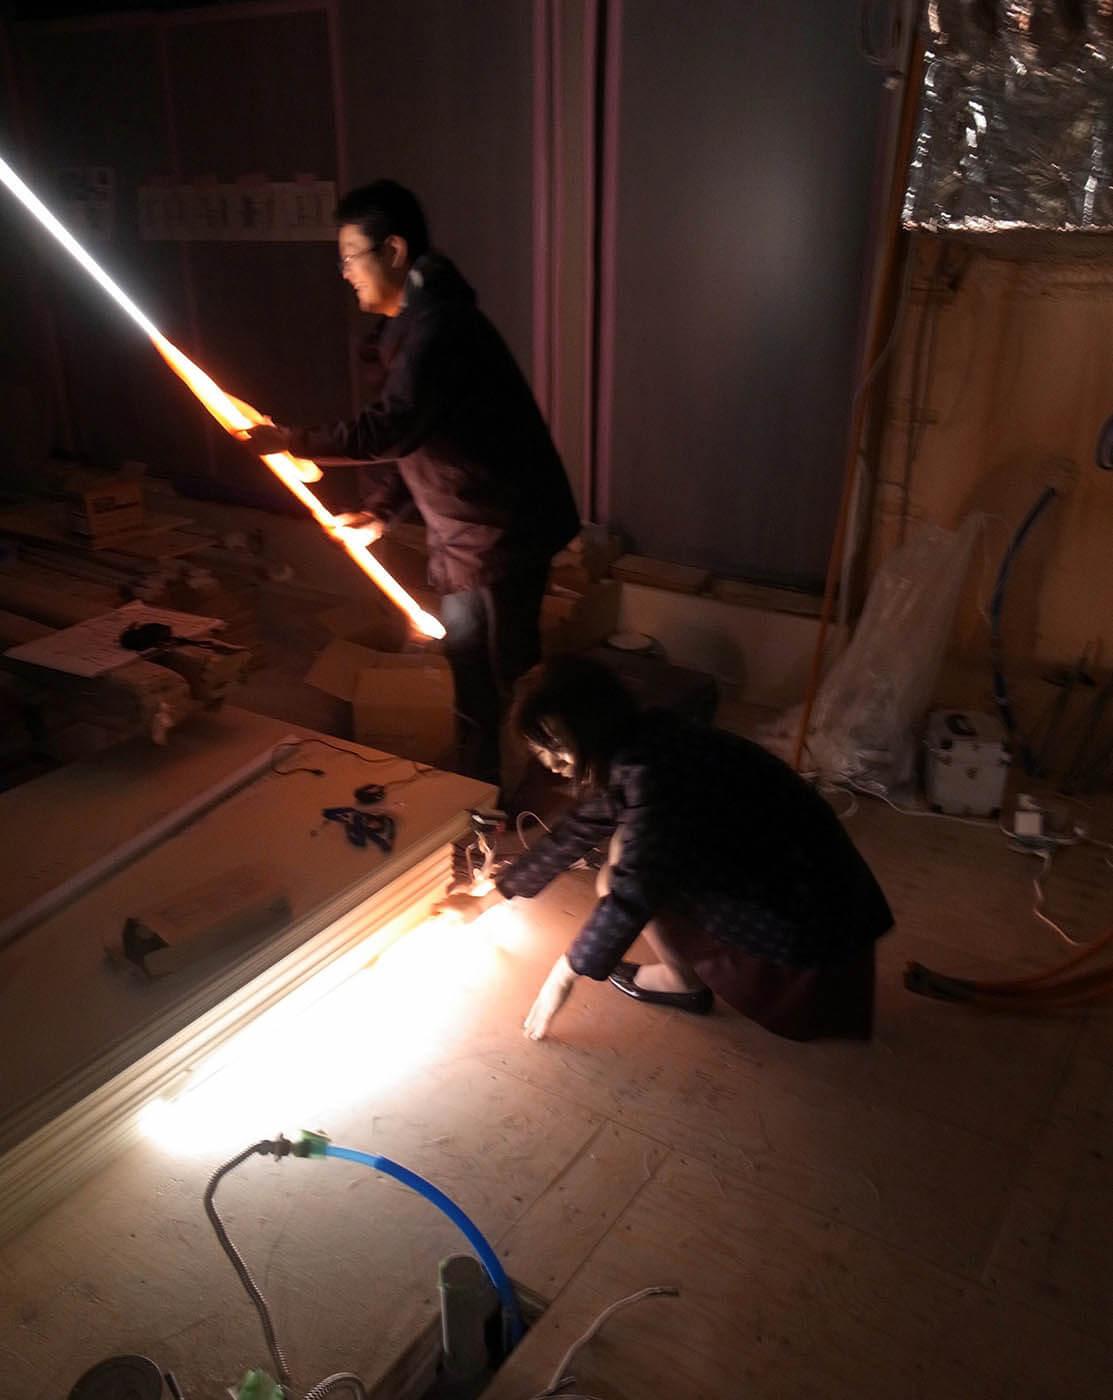 TVボード上の木製ルーバーの間接照明実験